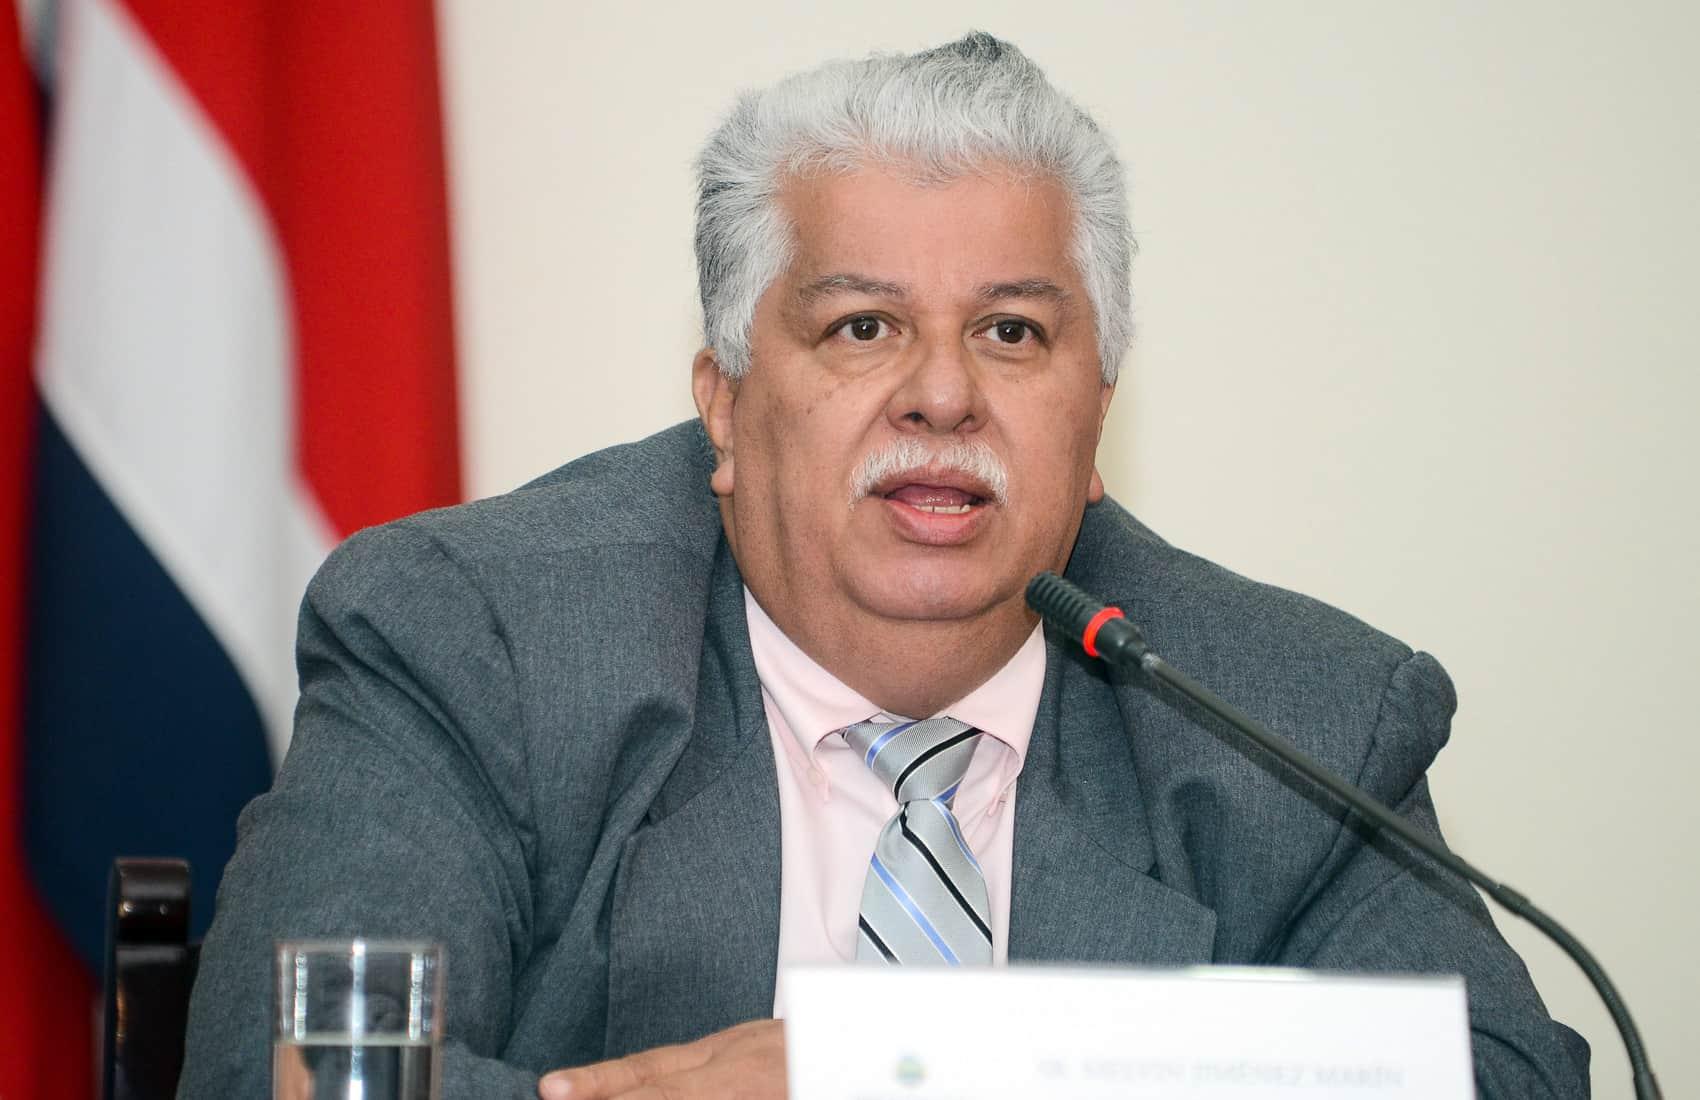 Presidency Minister Melvin Jiménez